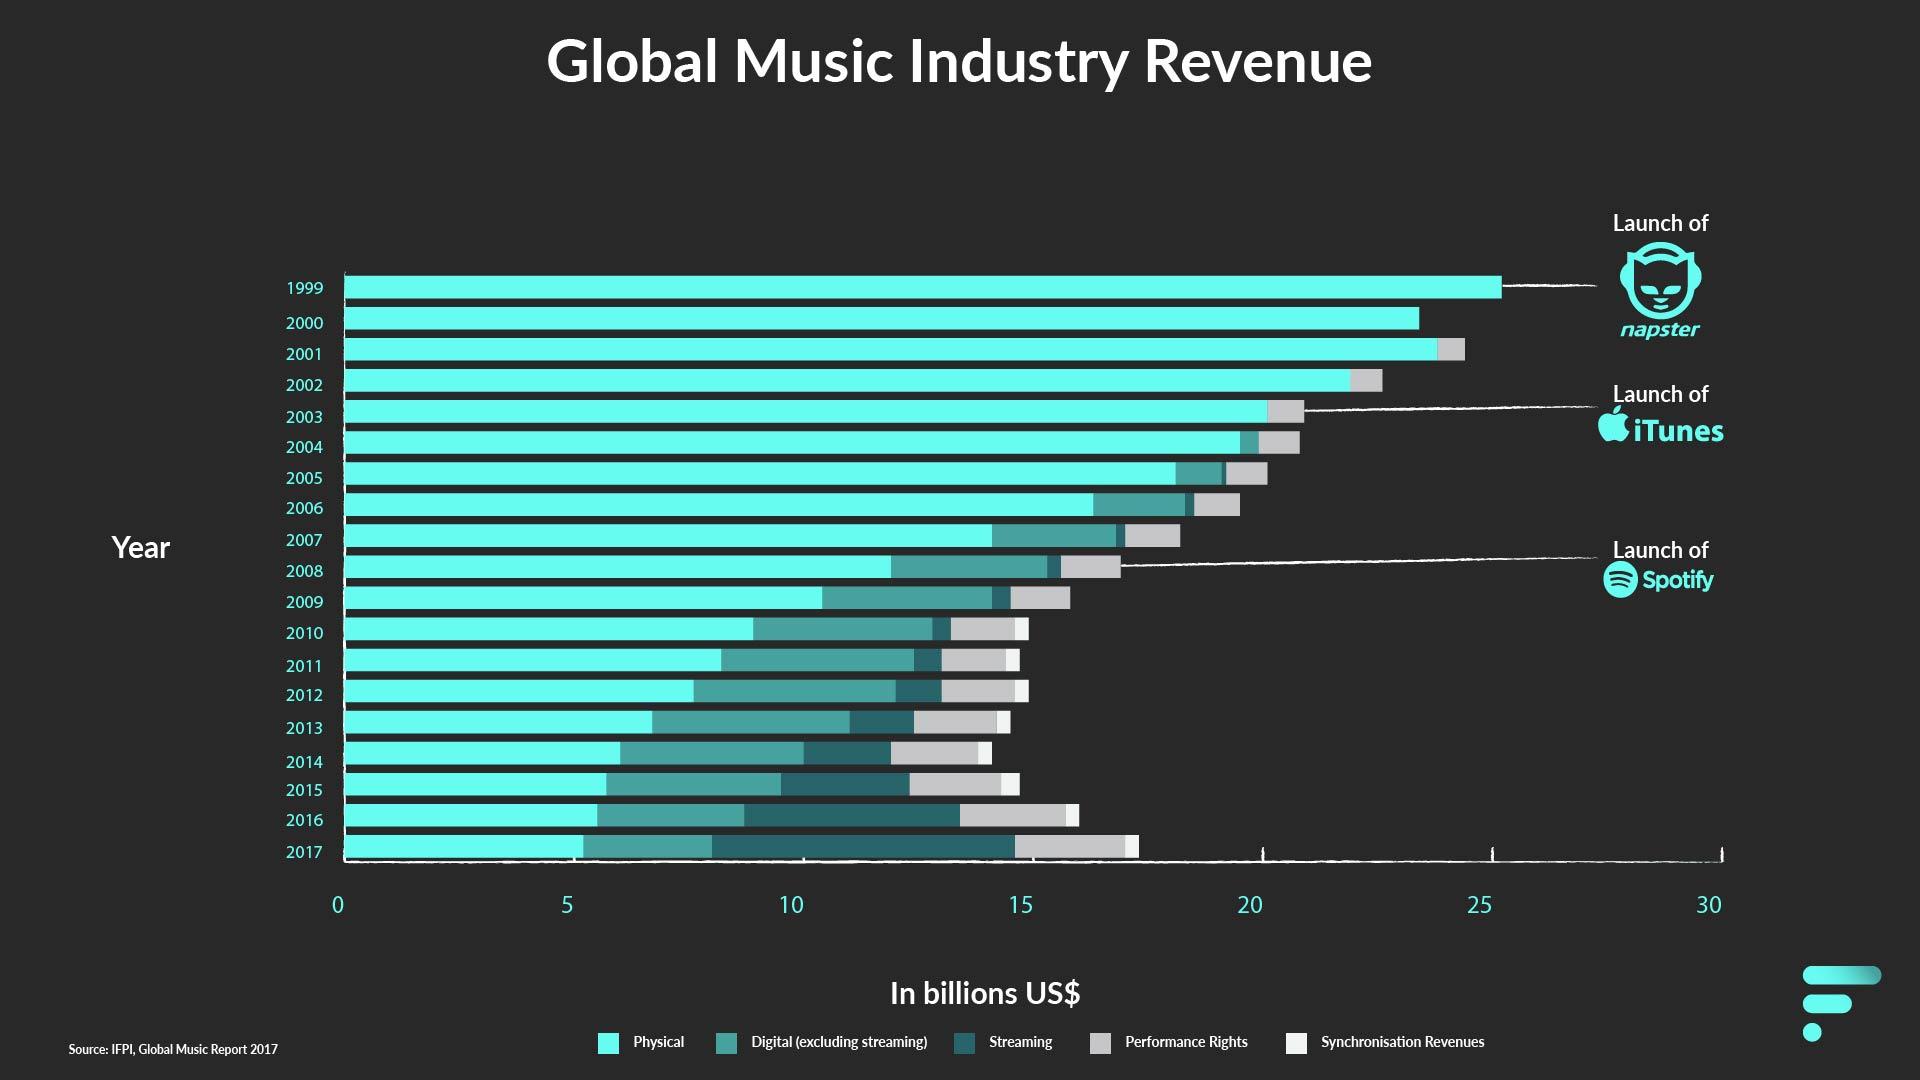 Global Music Industry Revenue - IFPI